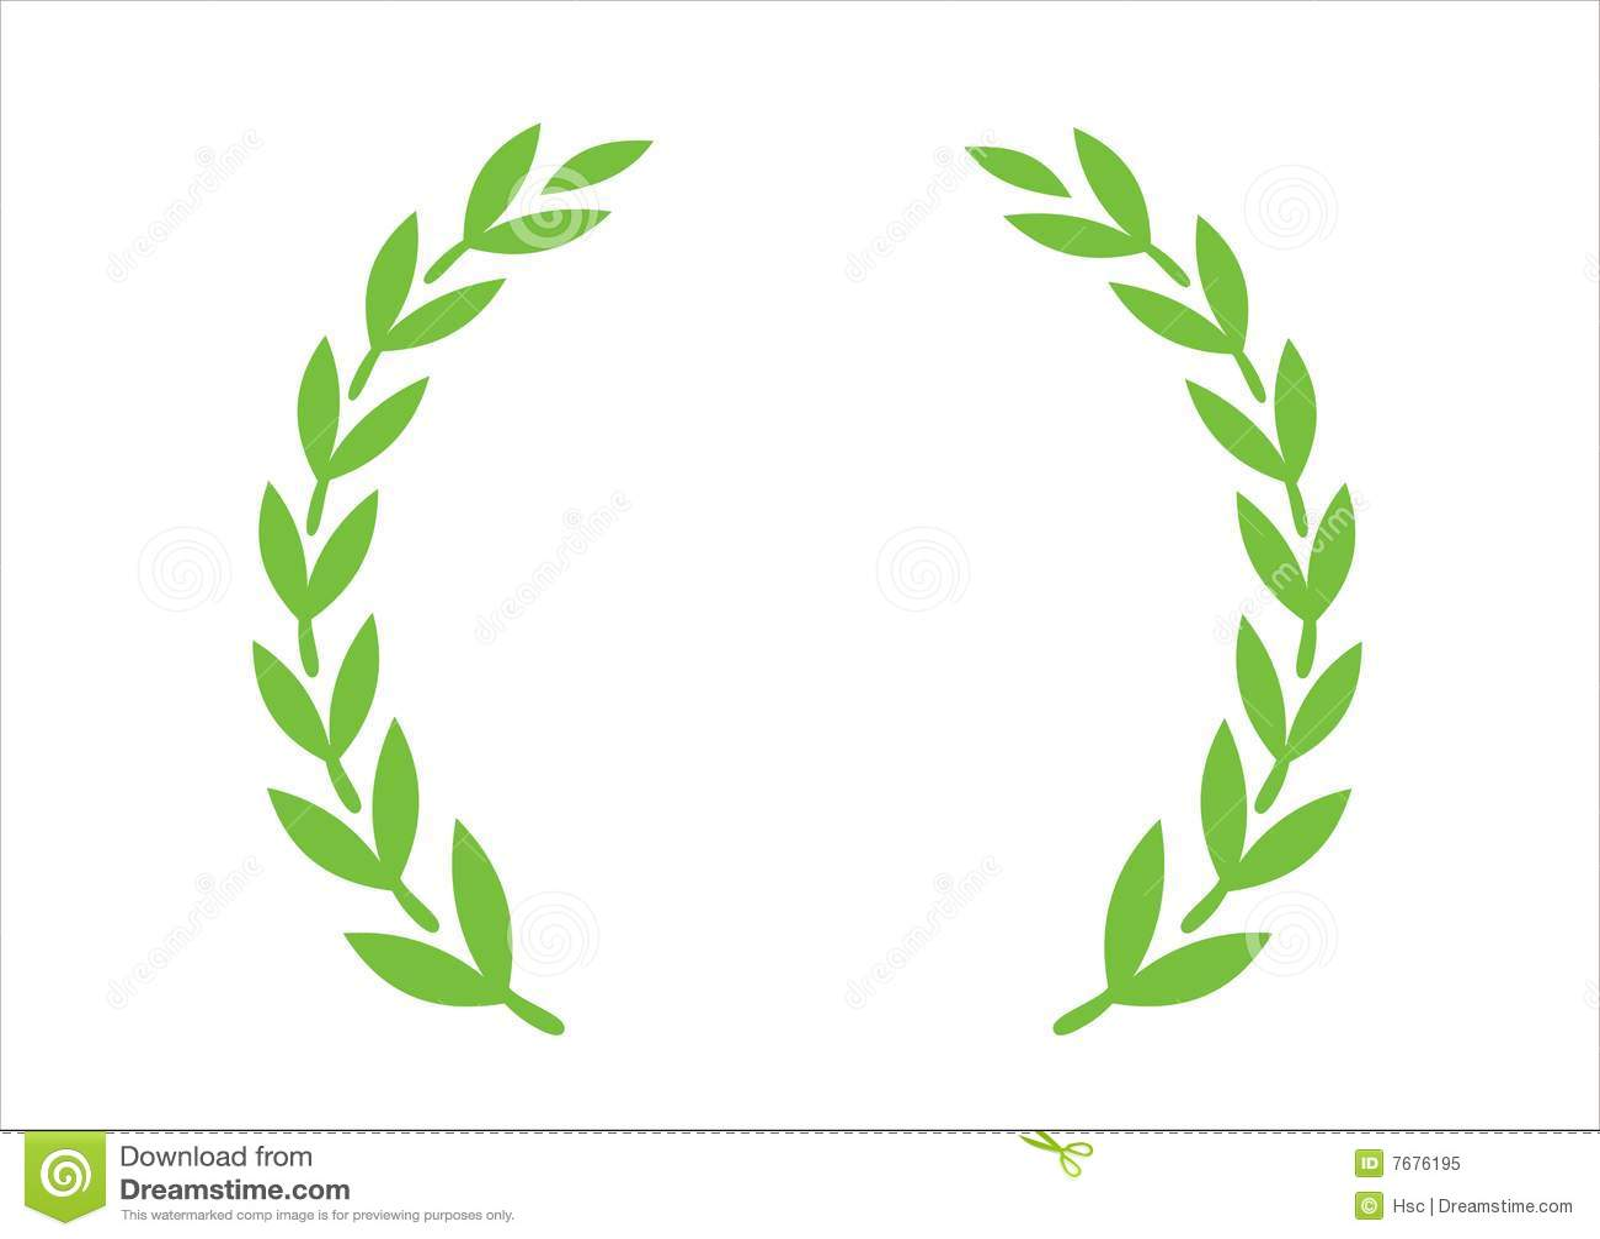 Olivgrüner Wreath